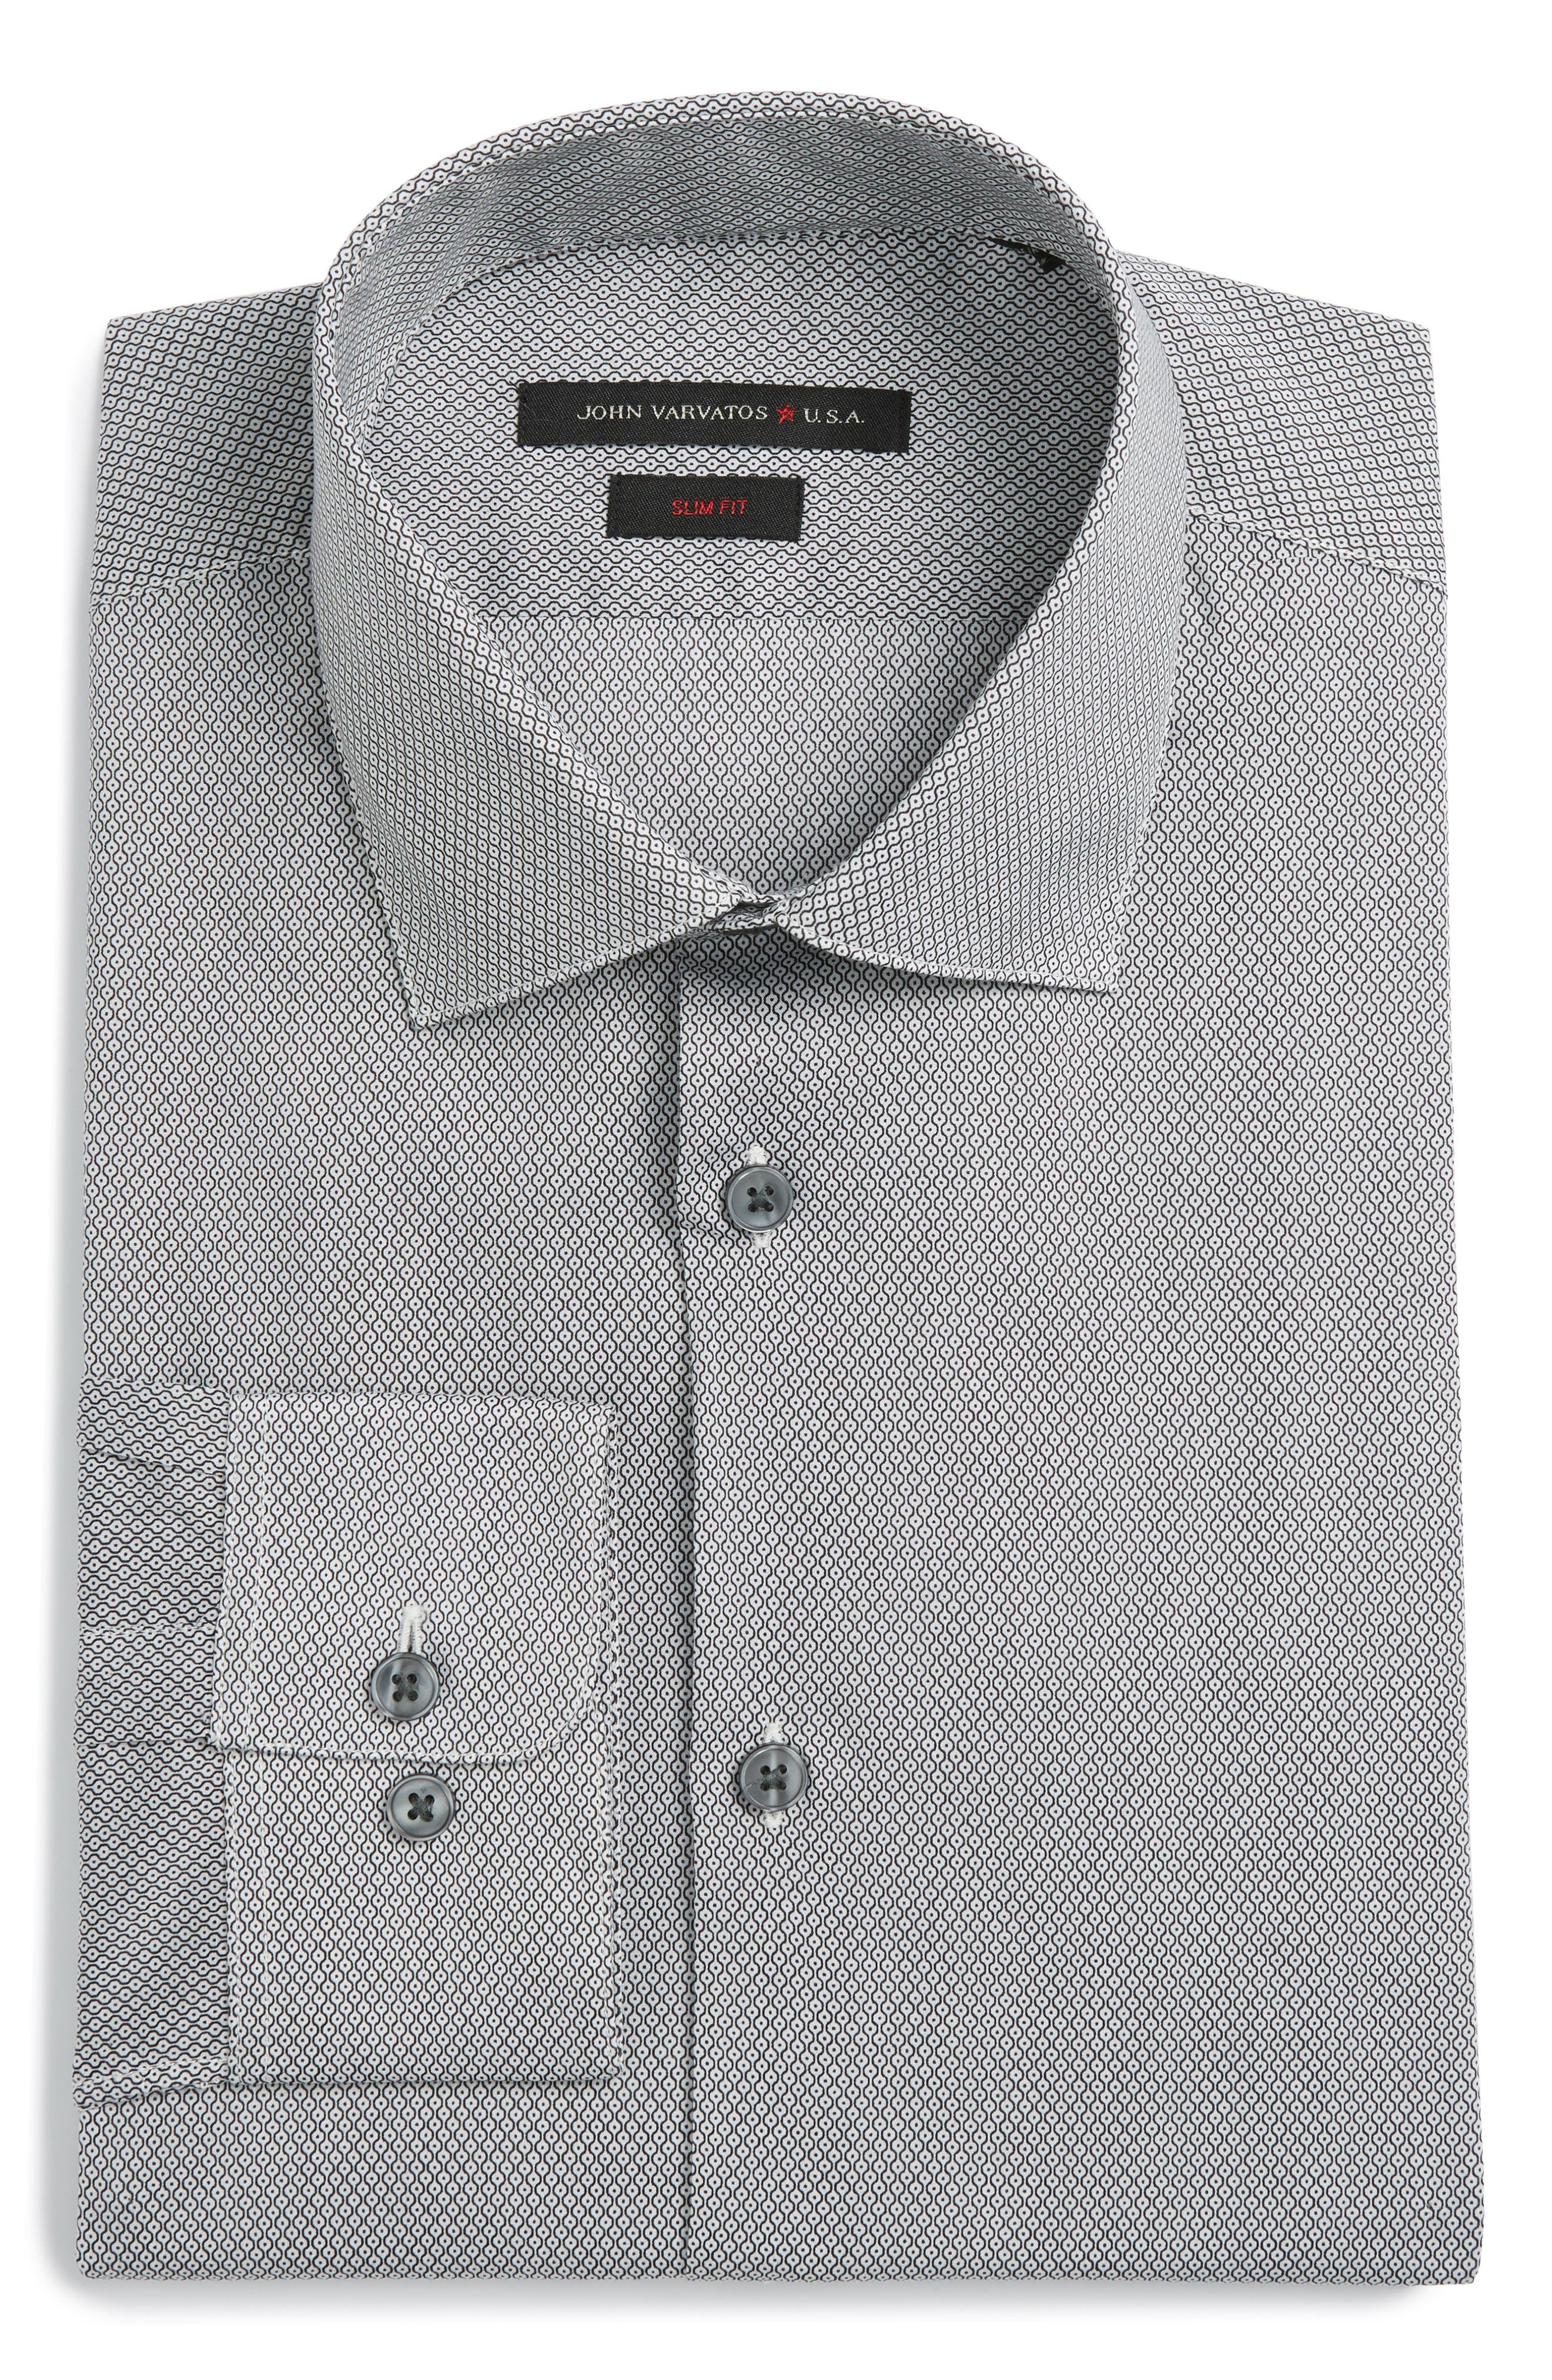 Slim Fit Geometric Dress Shirt,                             Main thumbnail 1, color,                             006